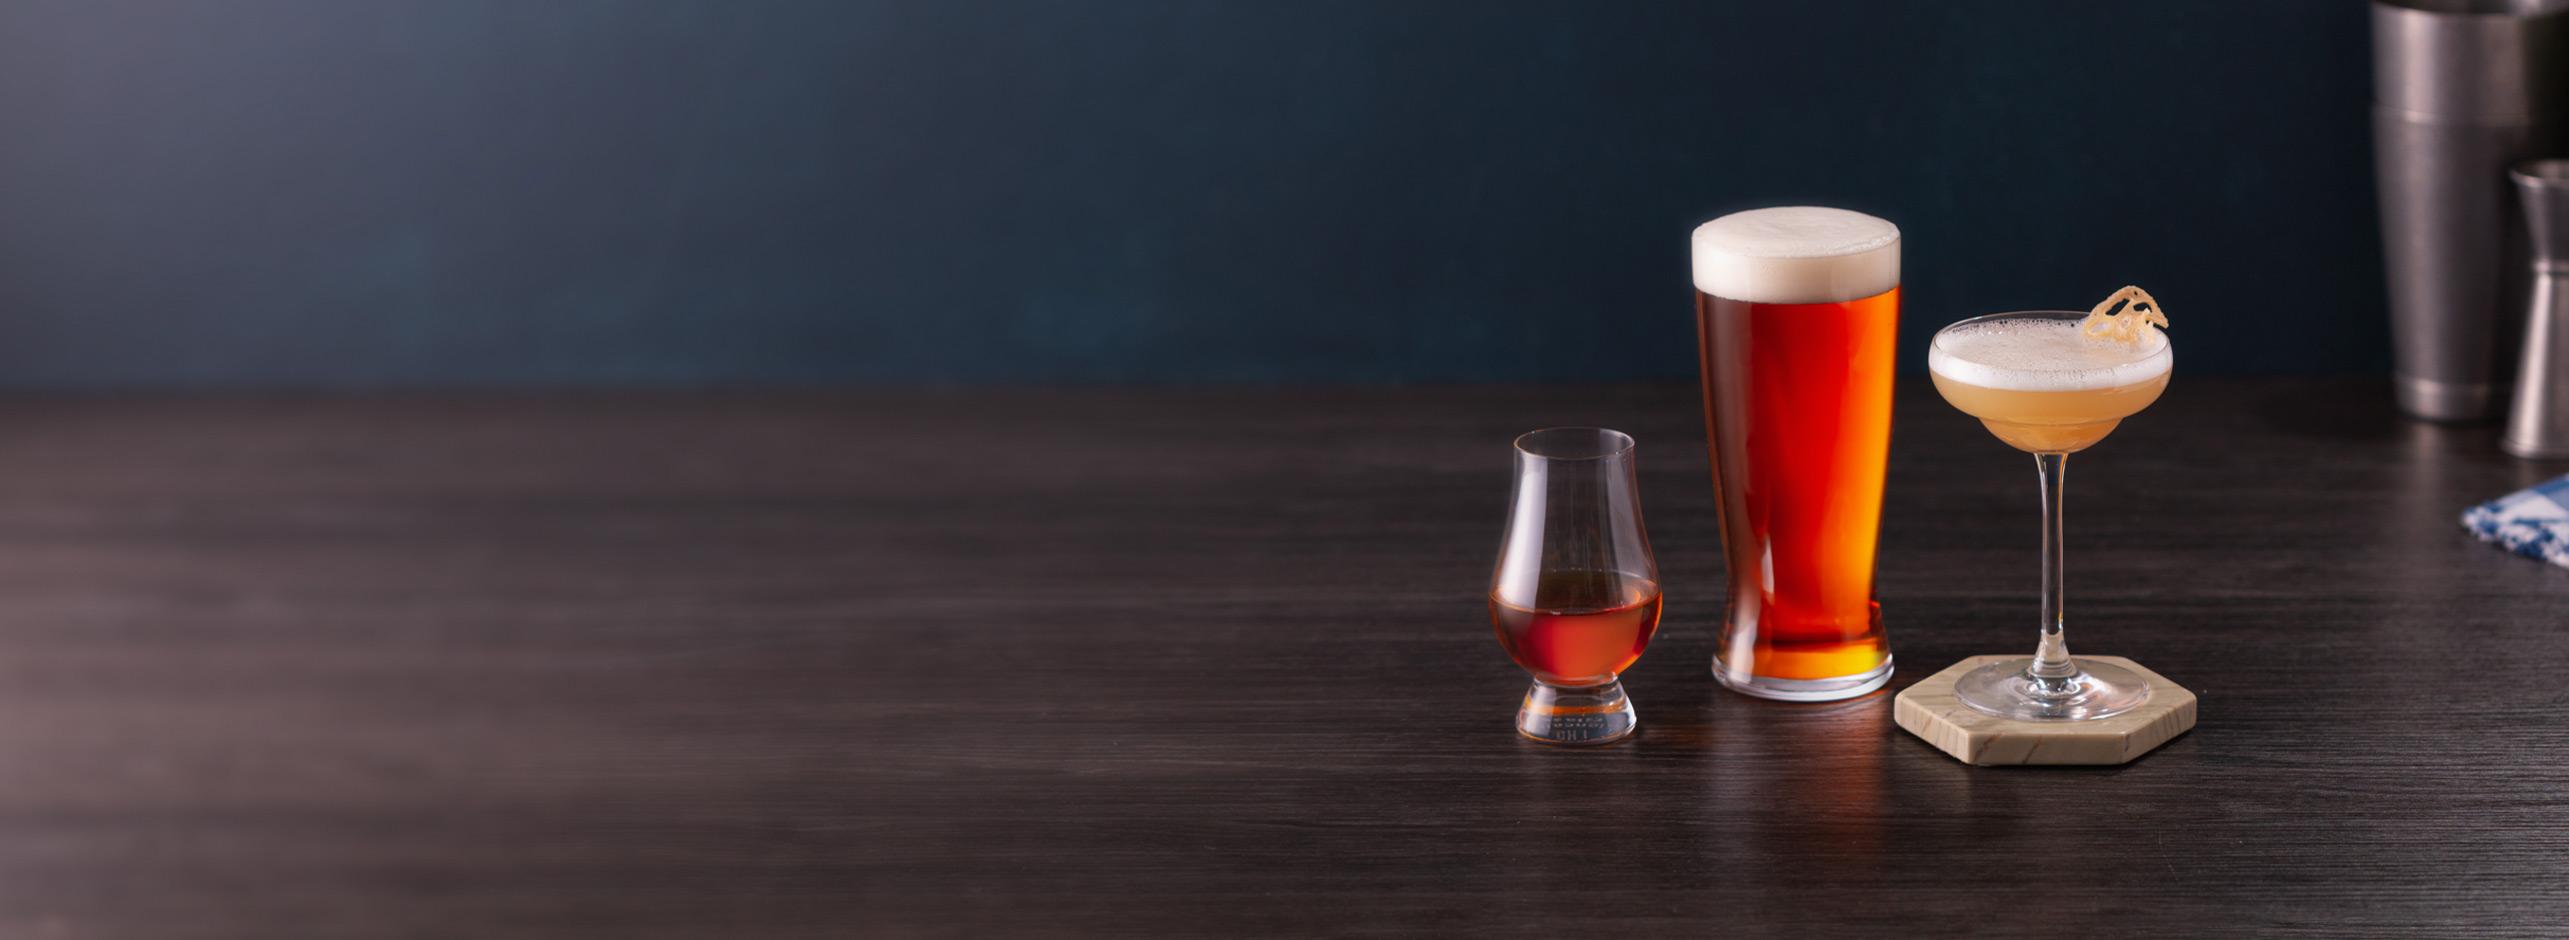 15 Off Drinkware - DRINKITUP